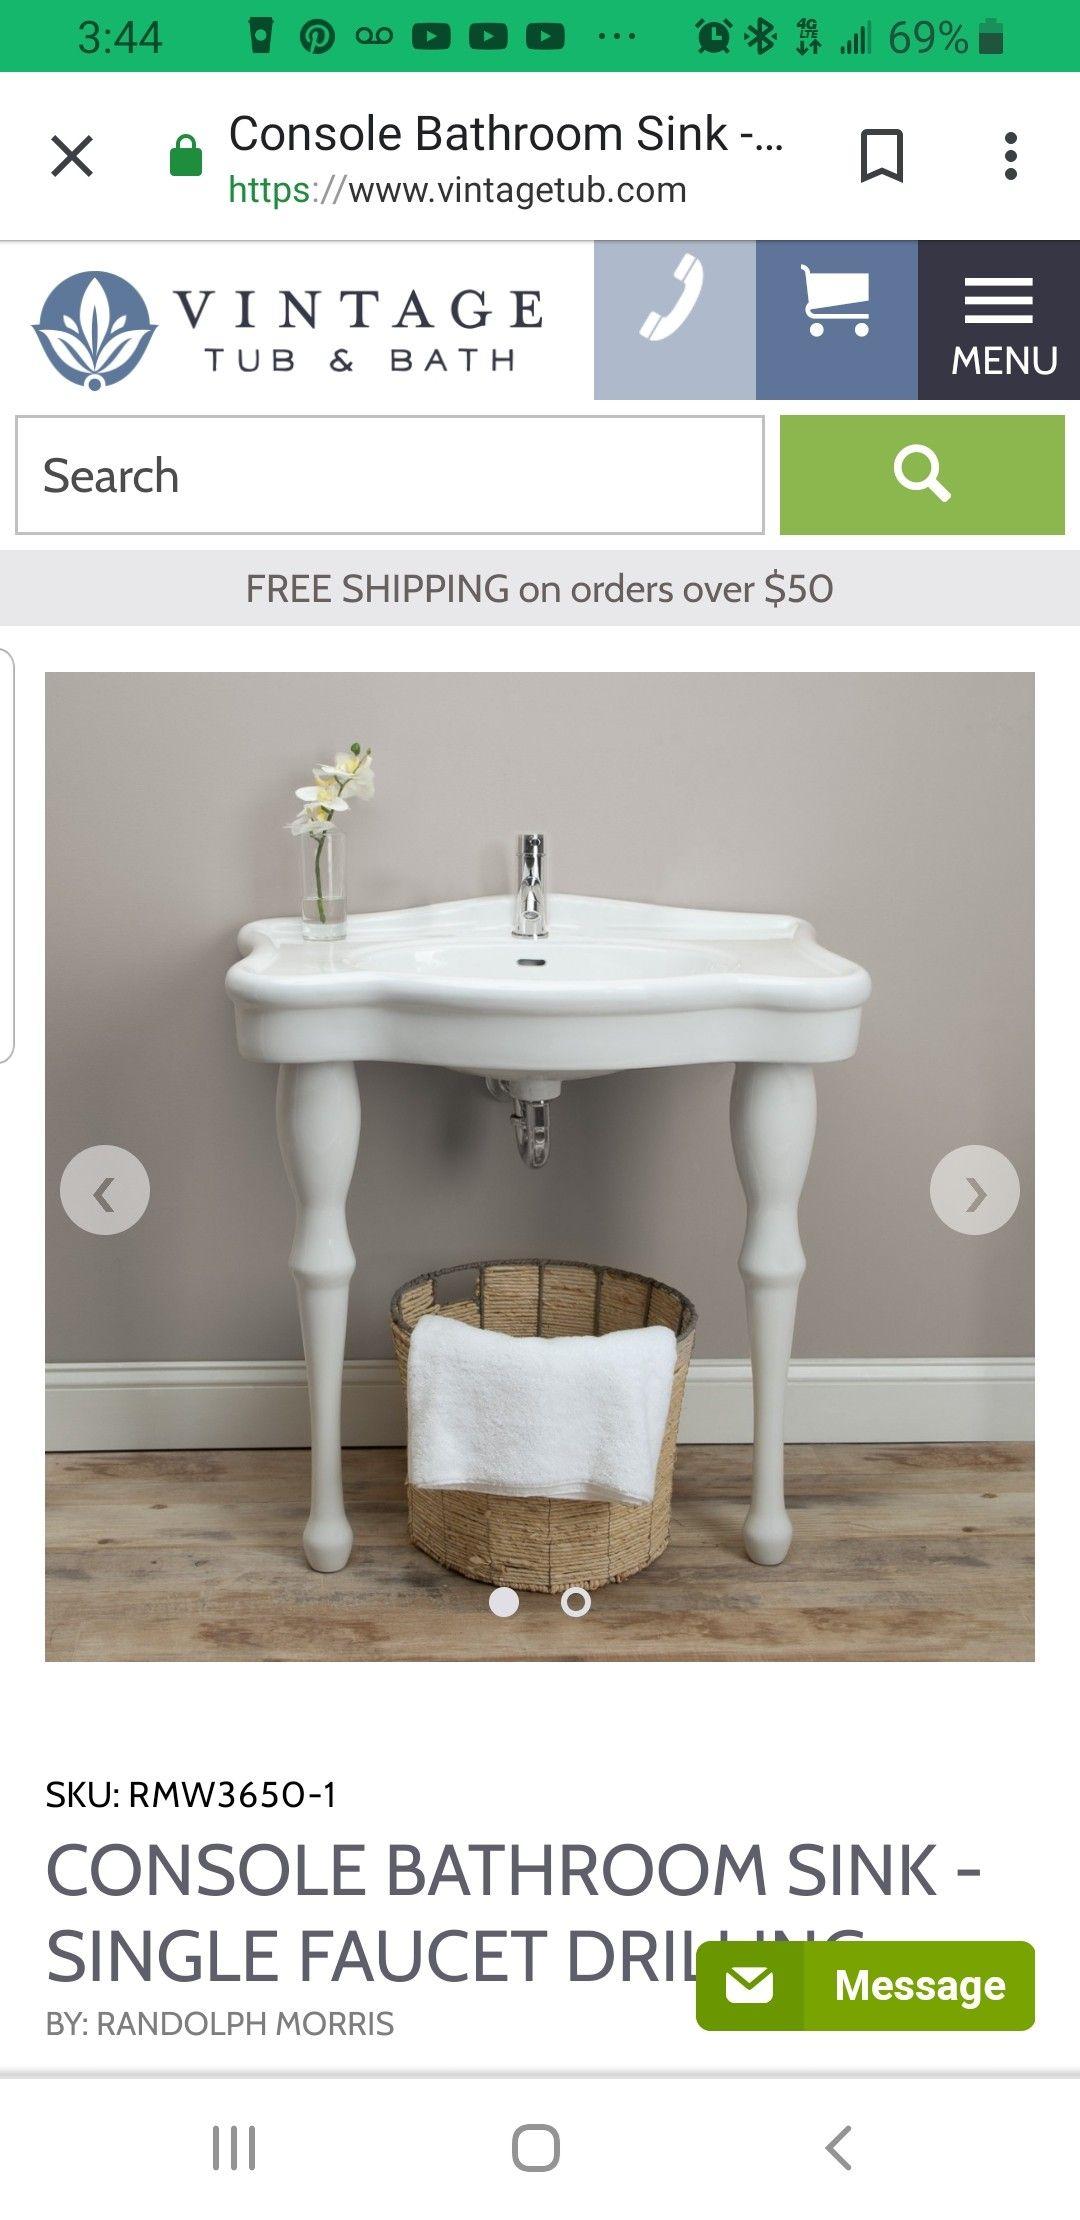 Farmhouse Pedestal Sink Vintage Tub Bath Console Bathroom Sink Farmhouse Pedestal Sink [ 2220 x 1080 Pixel ]